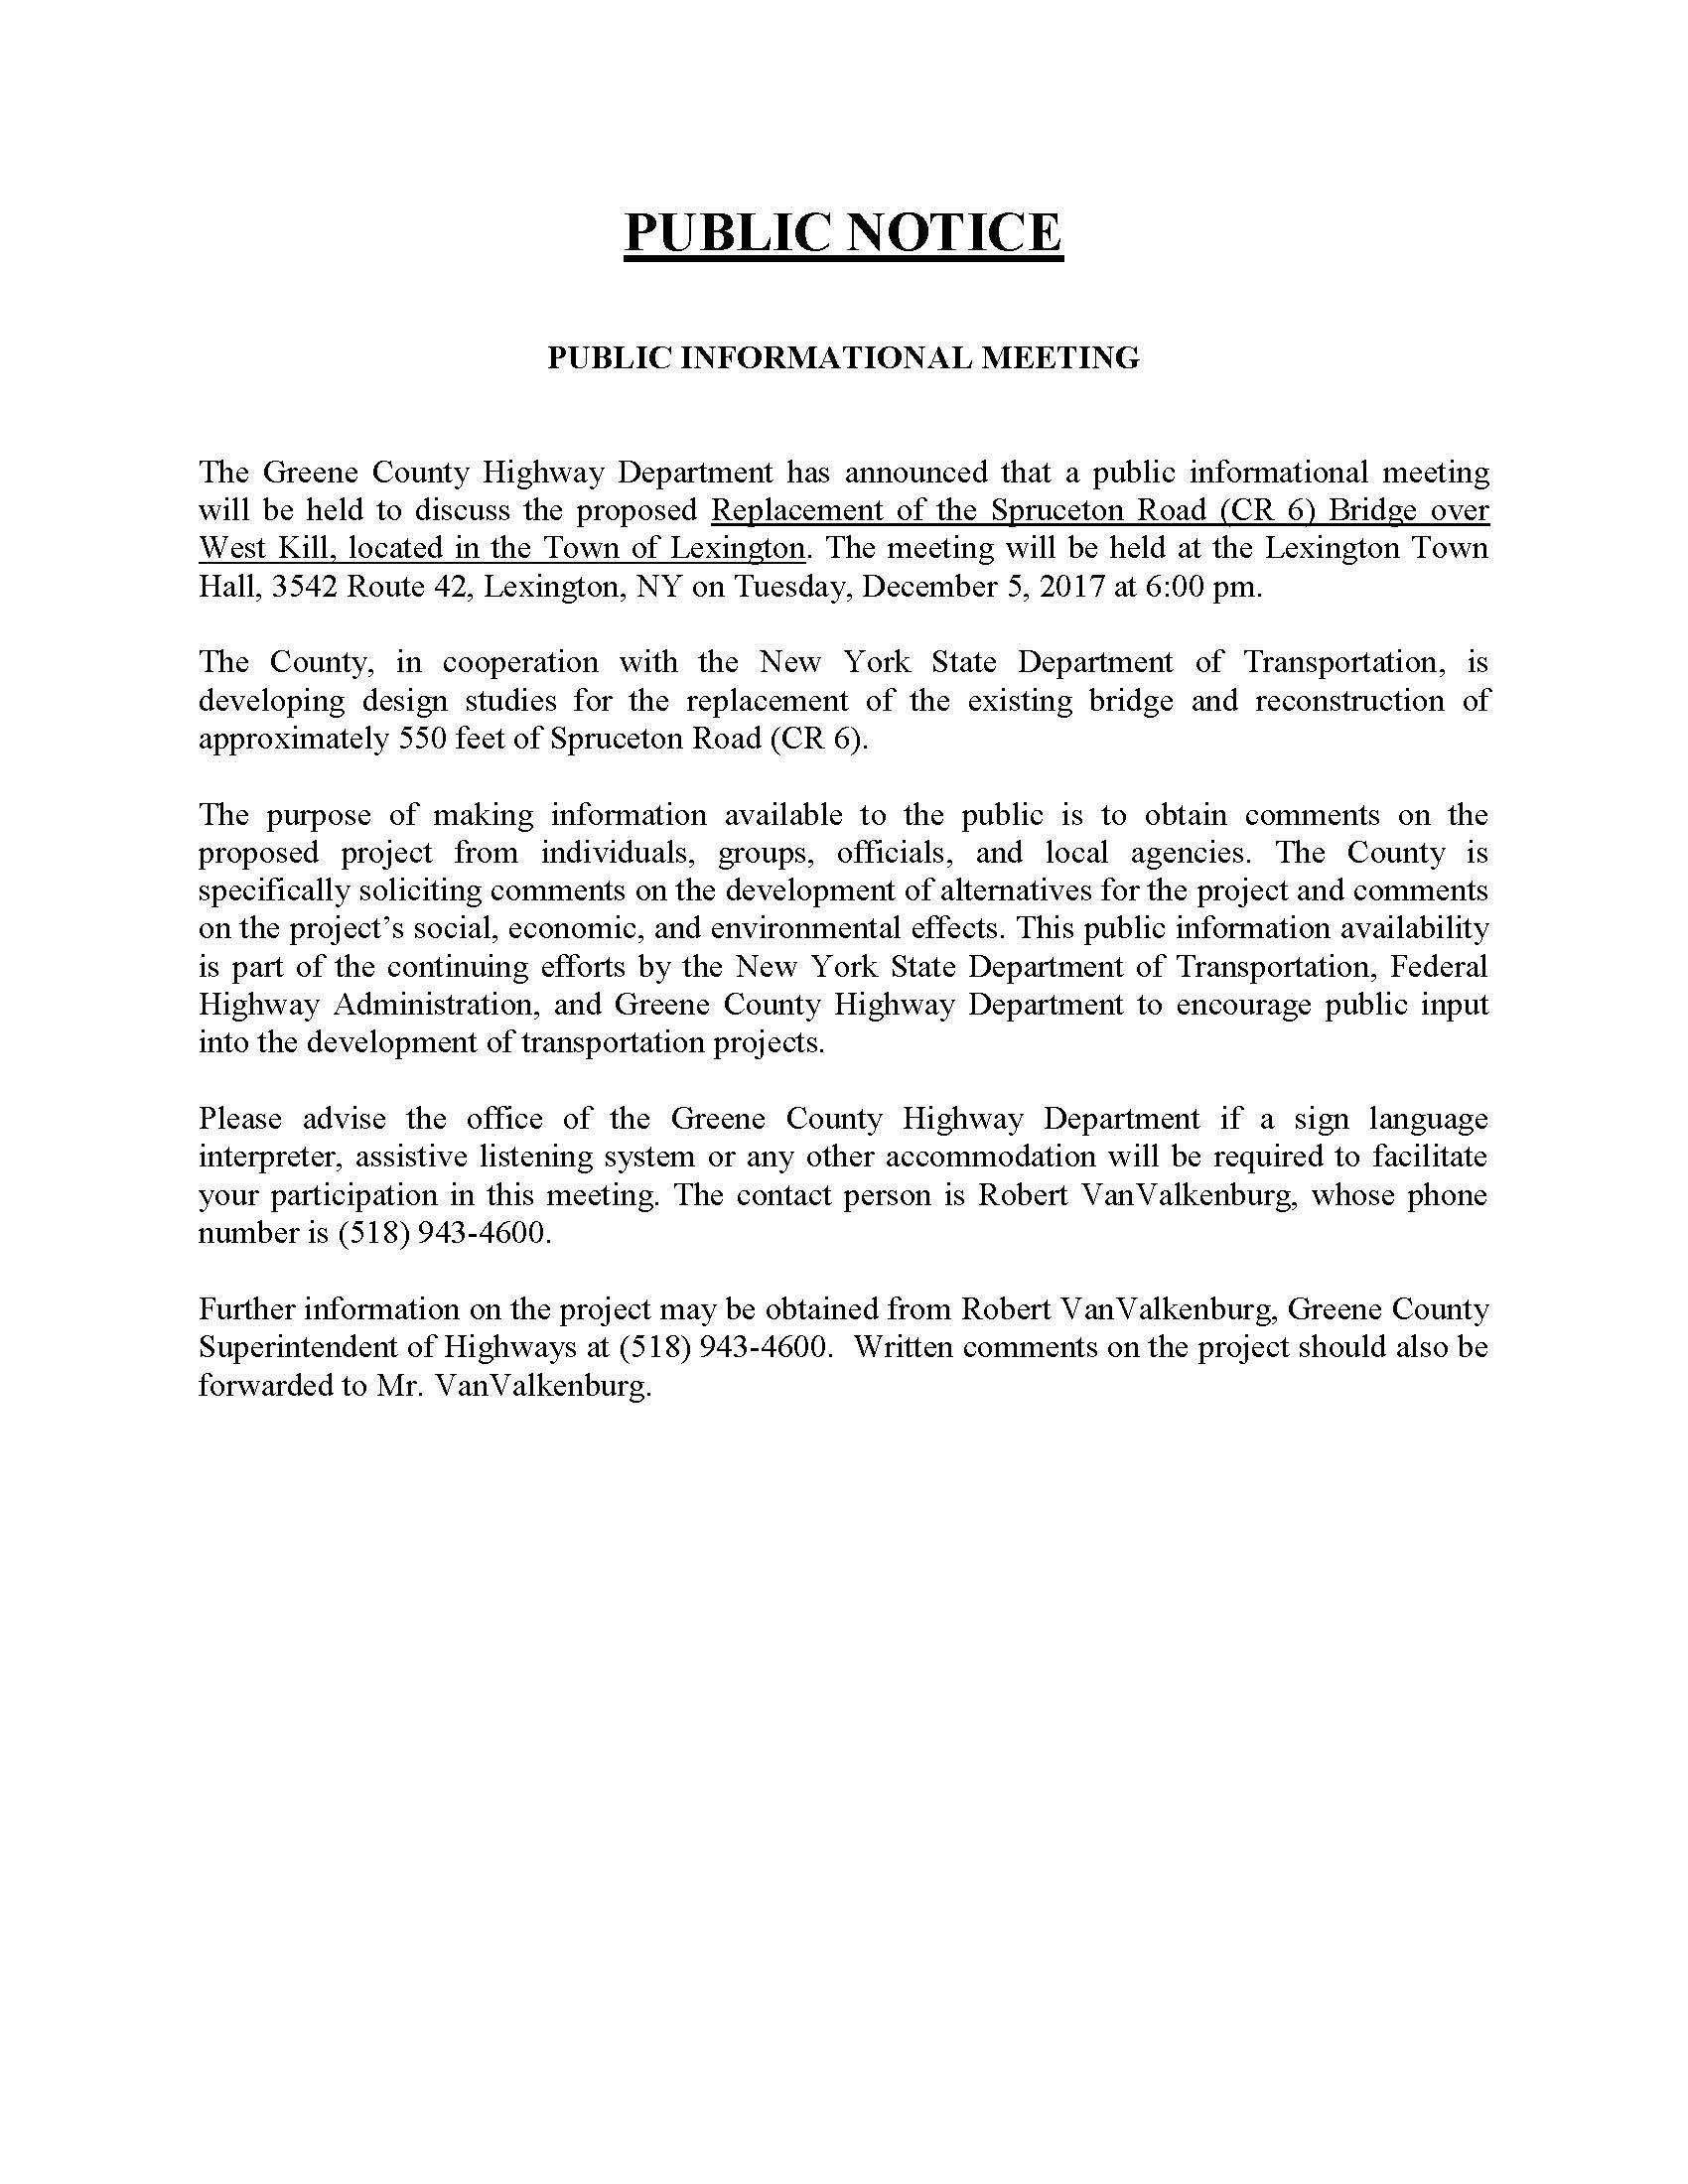 Public Notice - Public Informational Meeting - Replacement